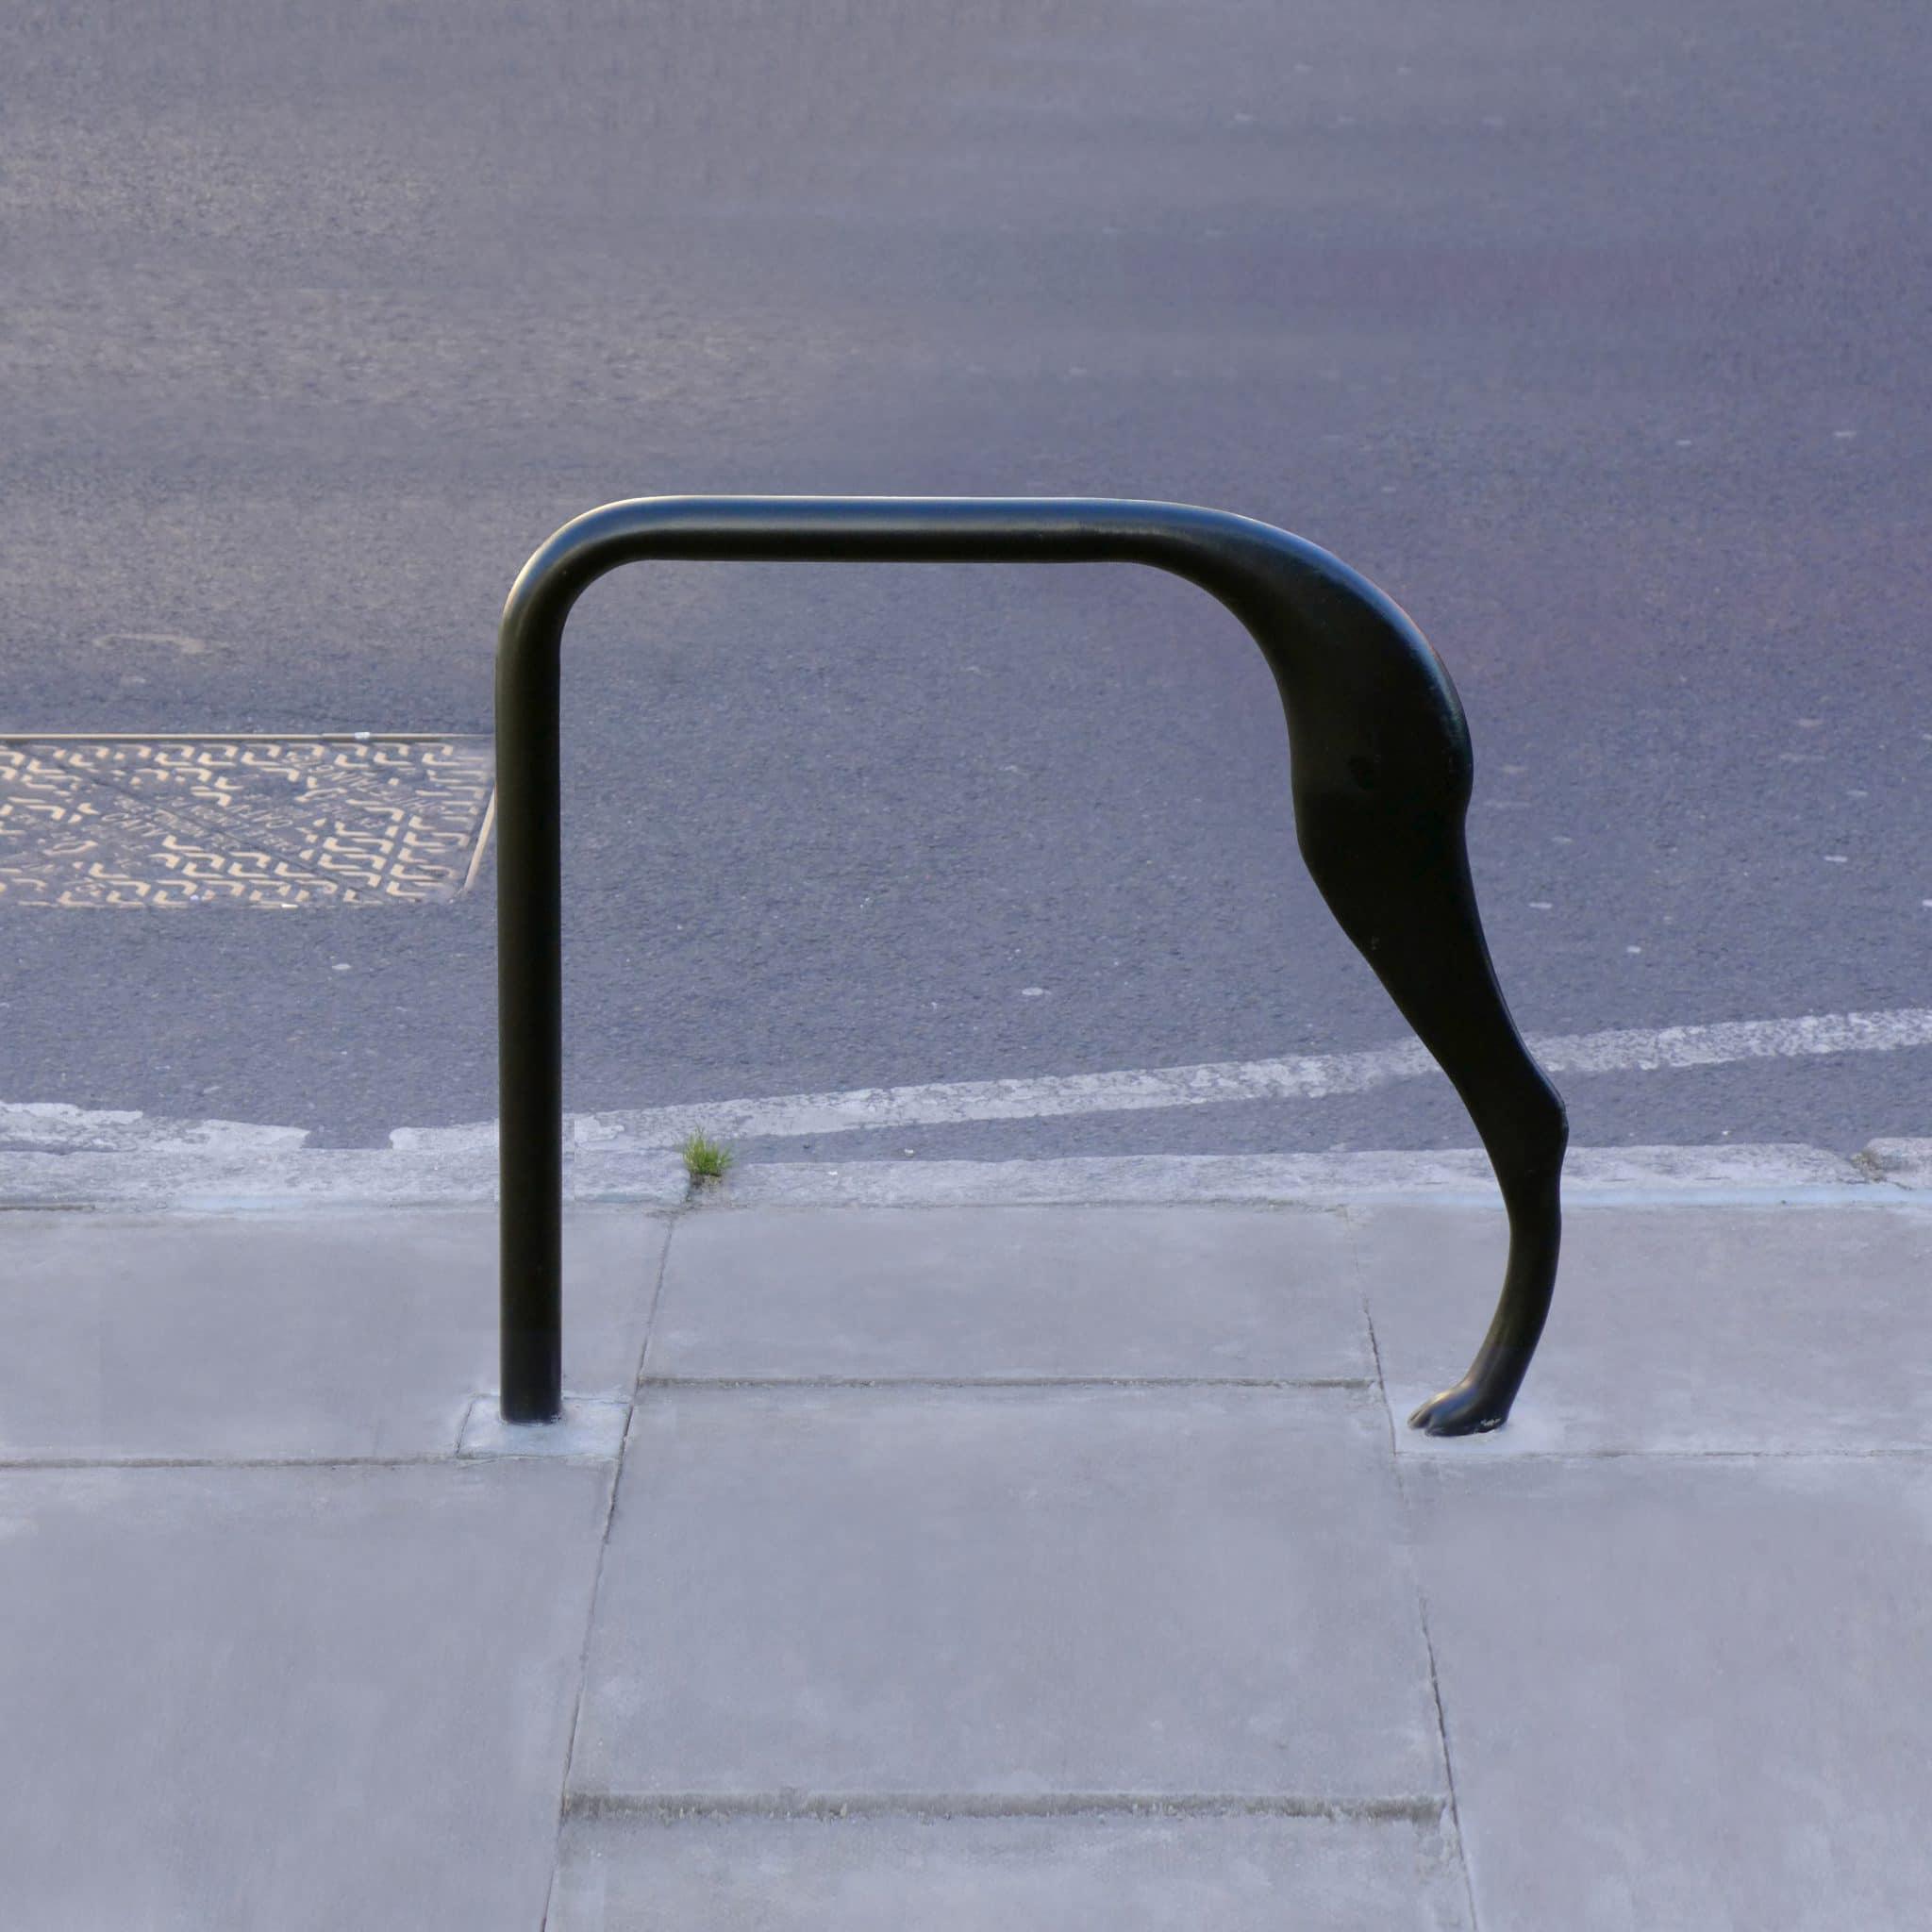 Public art bespoke cycle stand